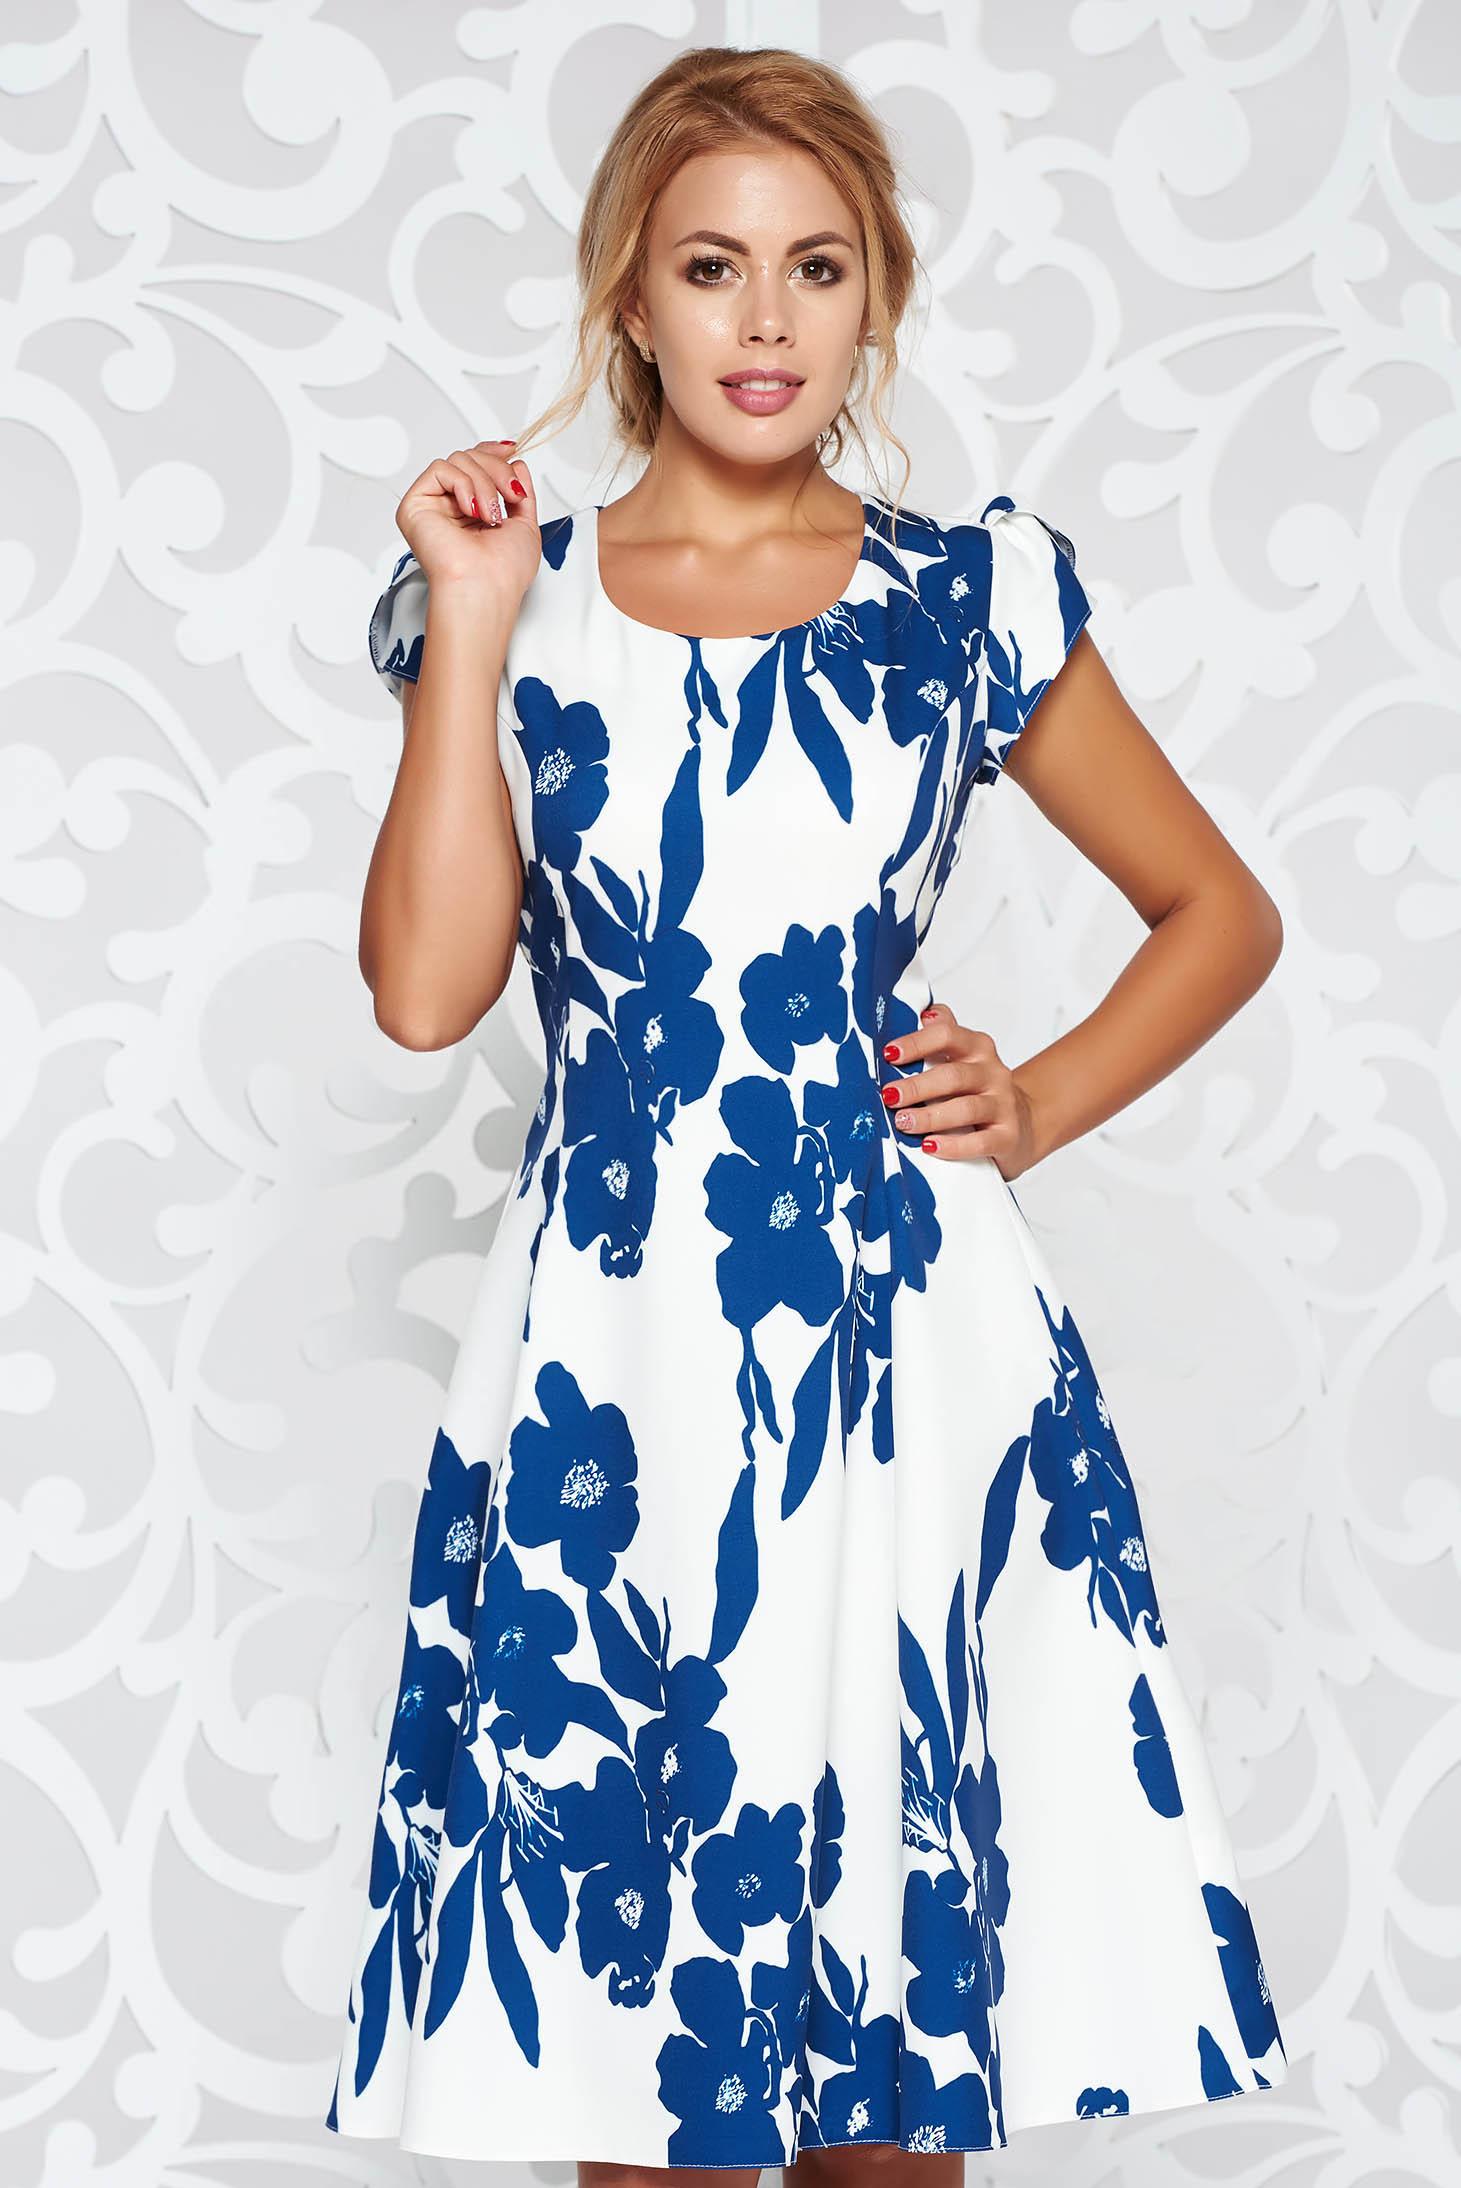 Rochie alba eleganta in clos material fin la atingere cu imprimeuri florale